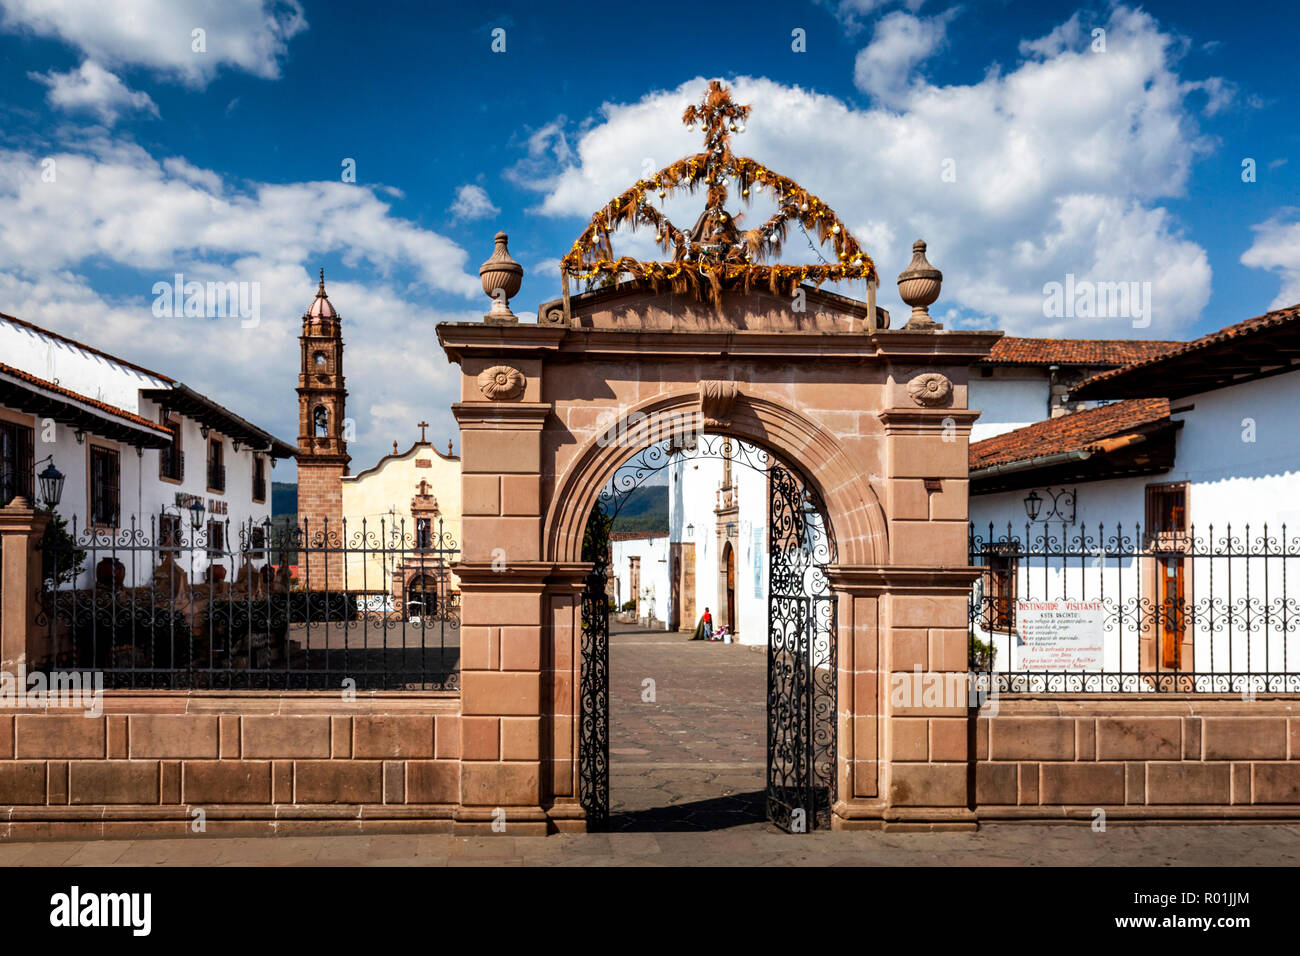 Plaza and church of Santa Clara del Cobre, Michoacan, Mexico. - Stock Image